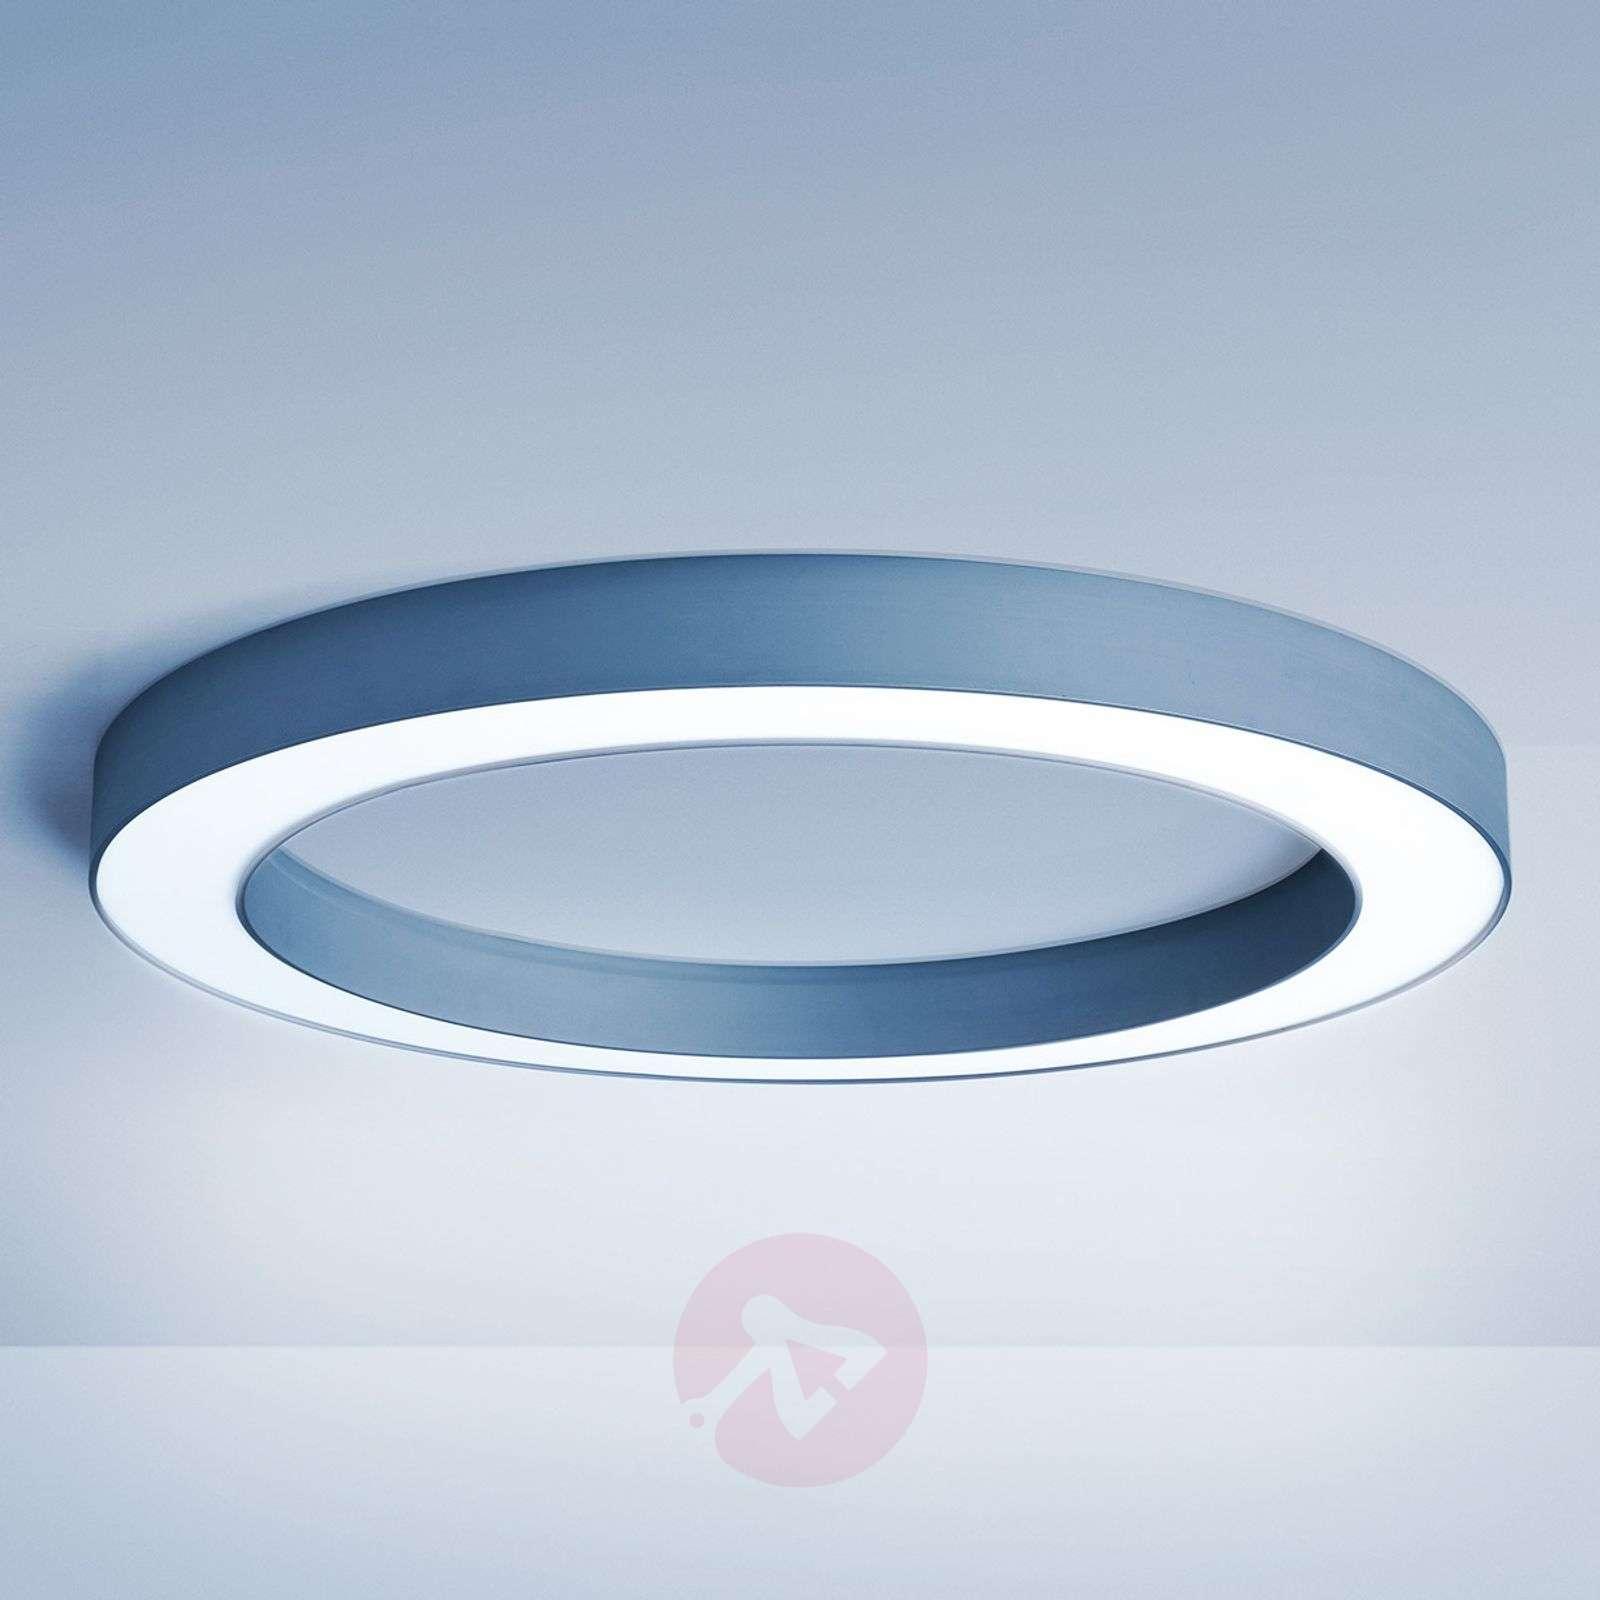 Ringo Star A1 Pyöreä LED-seinävalaisin-6033415X-01